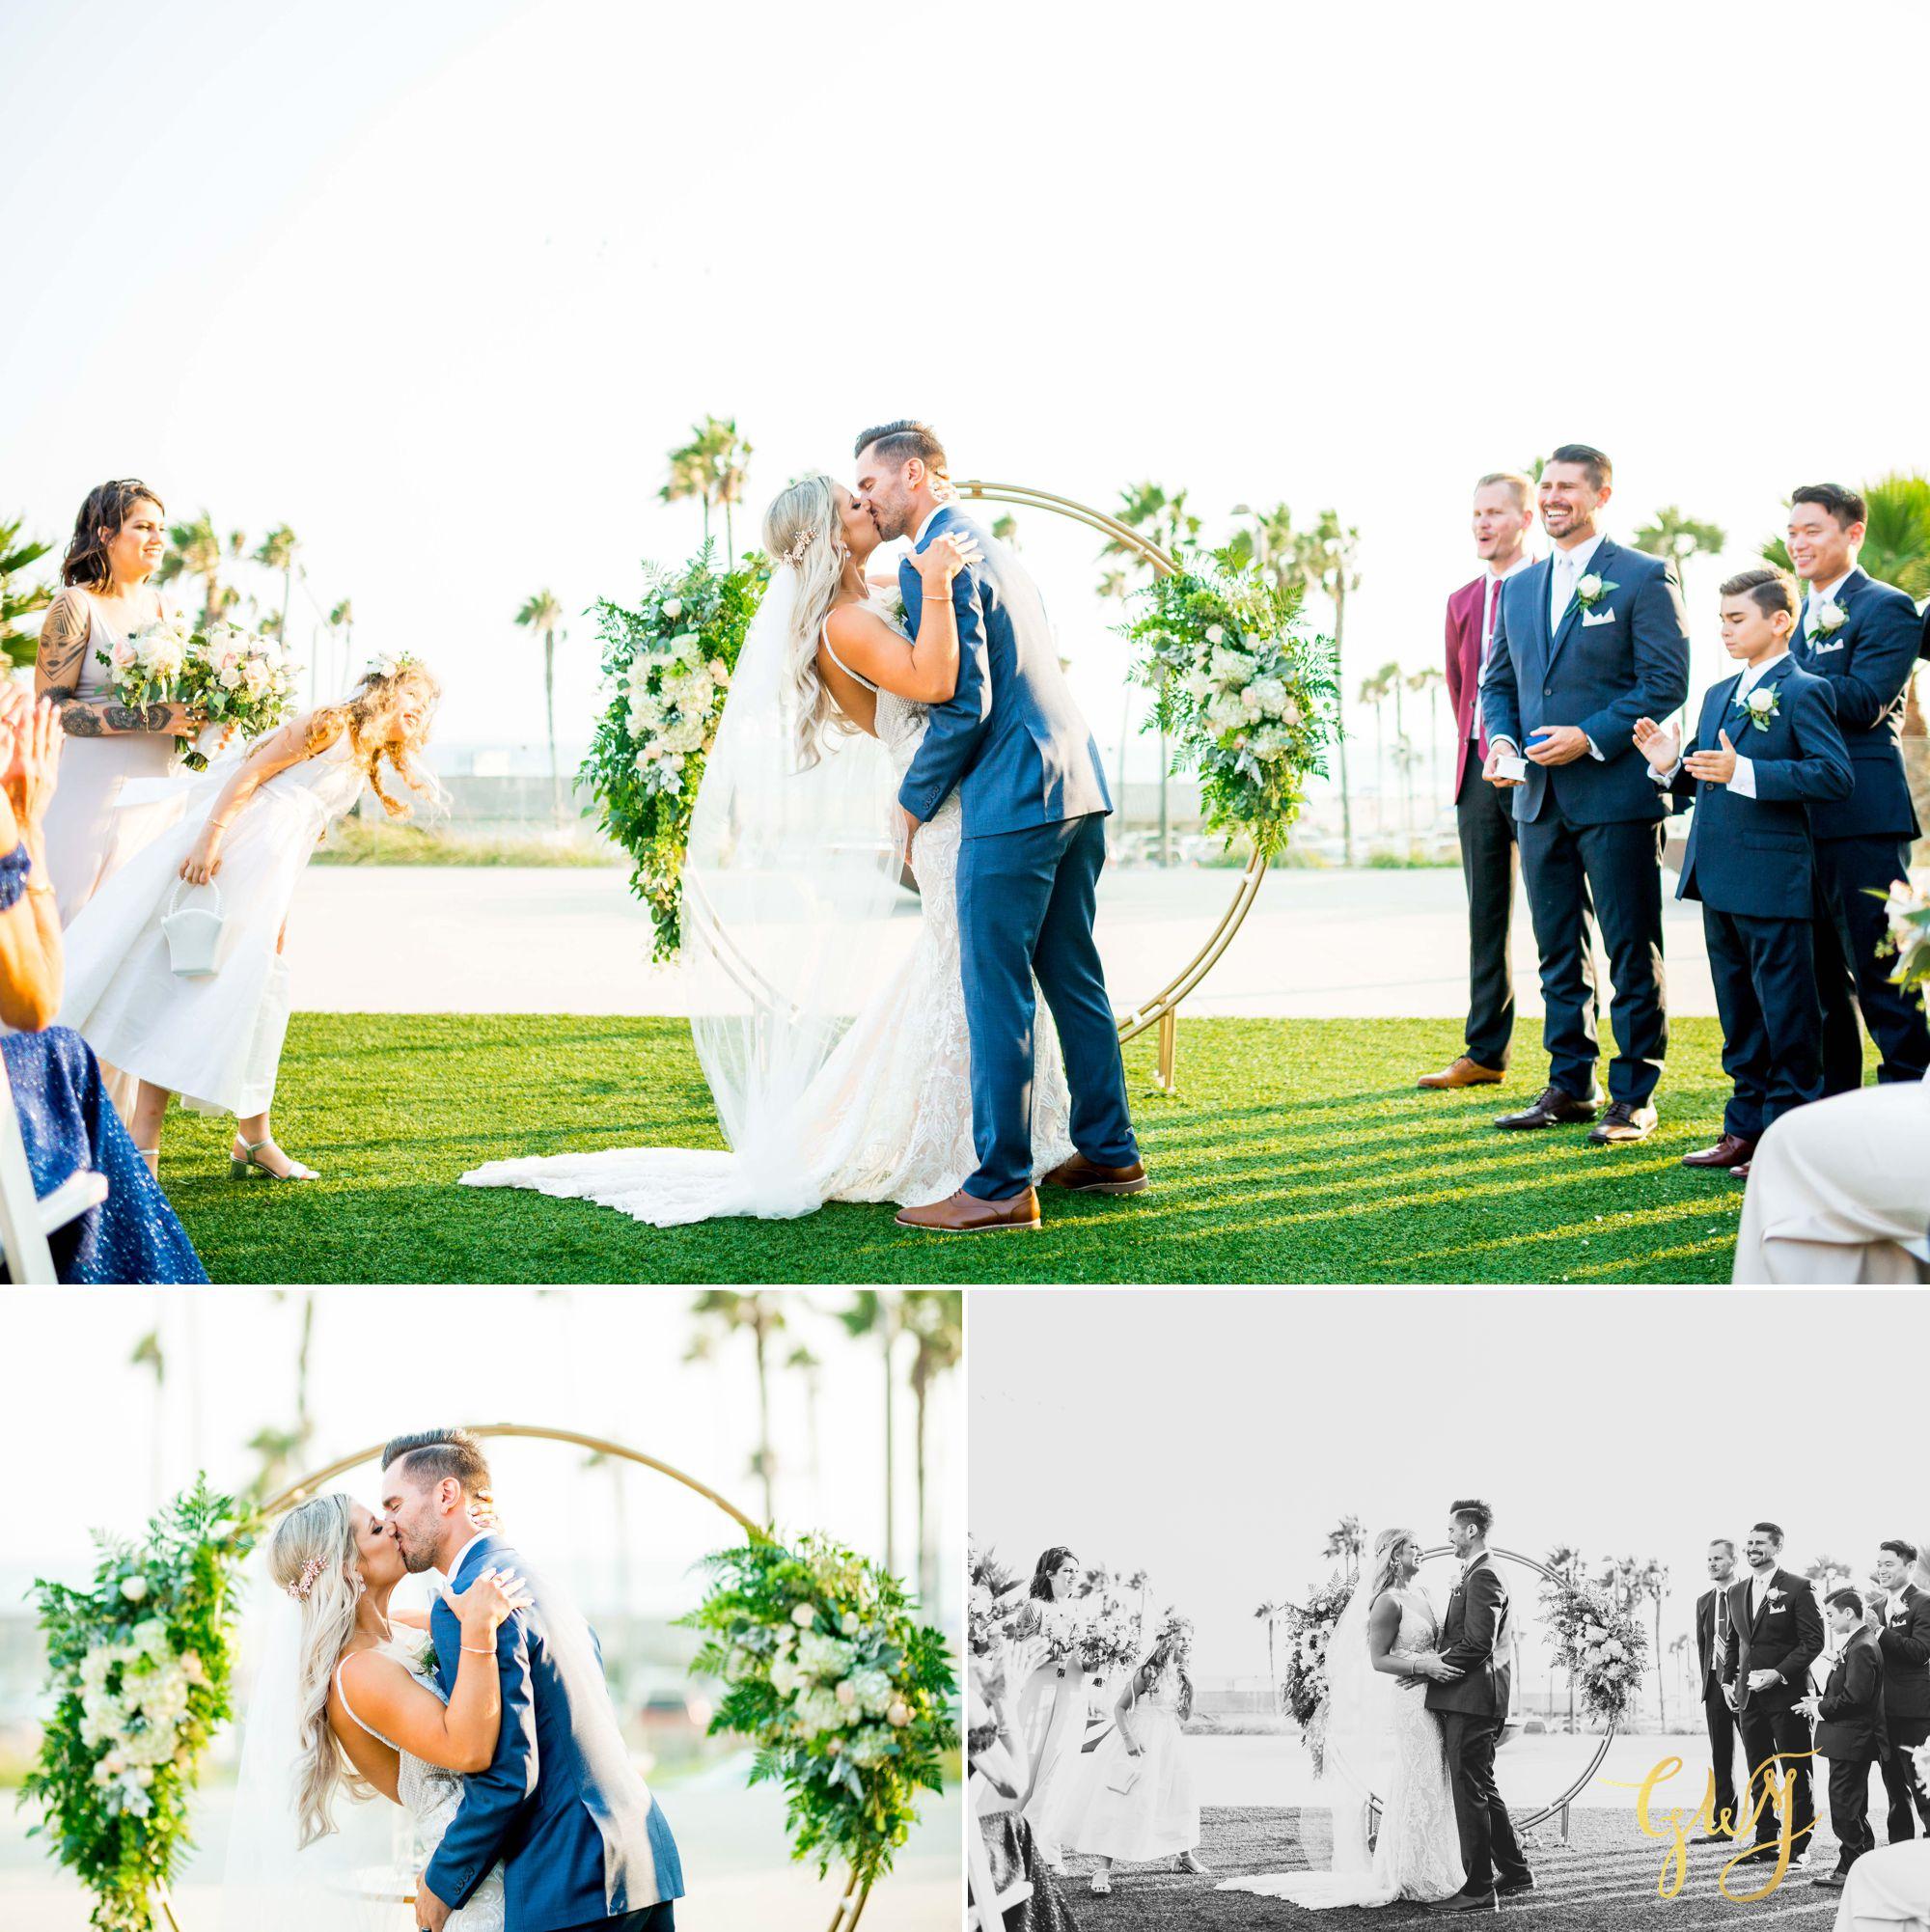 Christien + Crystal Pasea Hotel & Spa Huntington Beach Wedding by Glass Woods Media 50.jpg